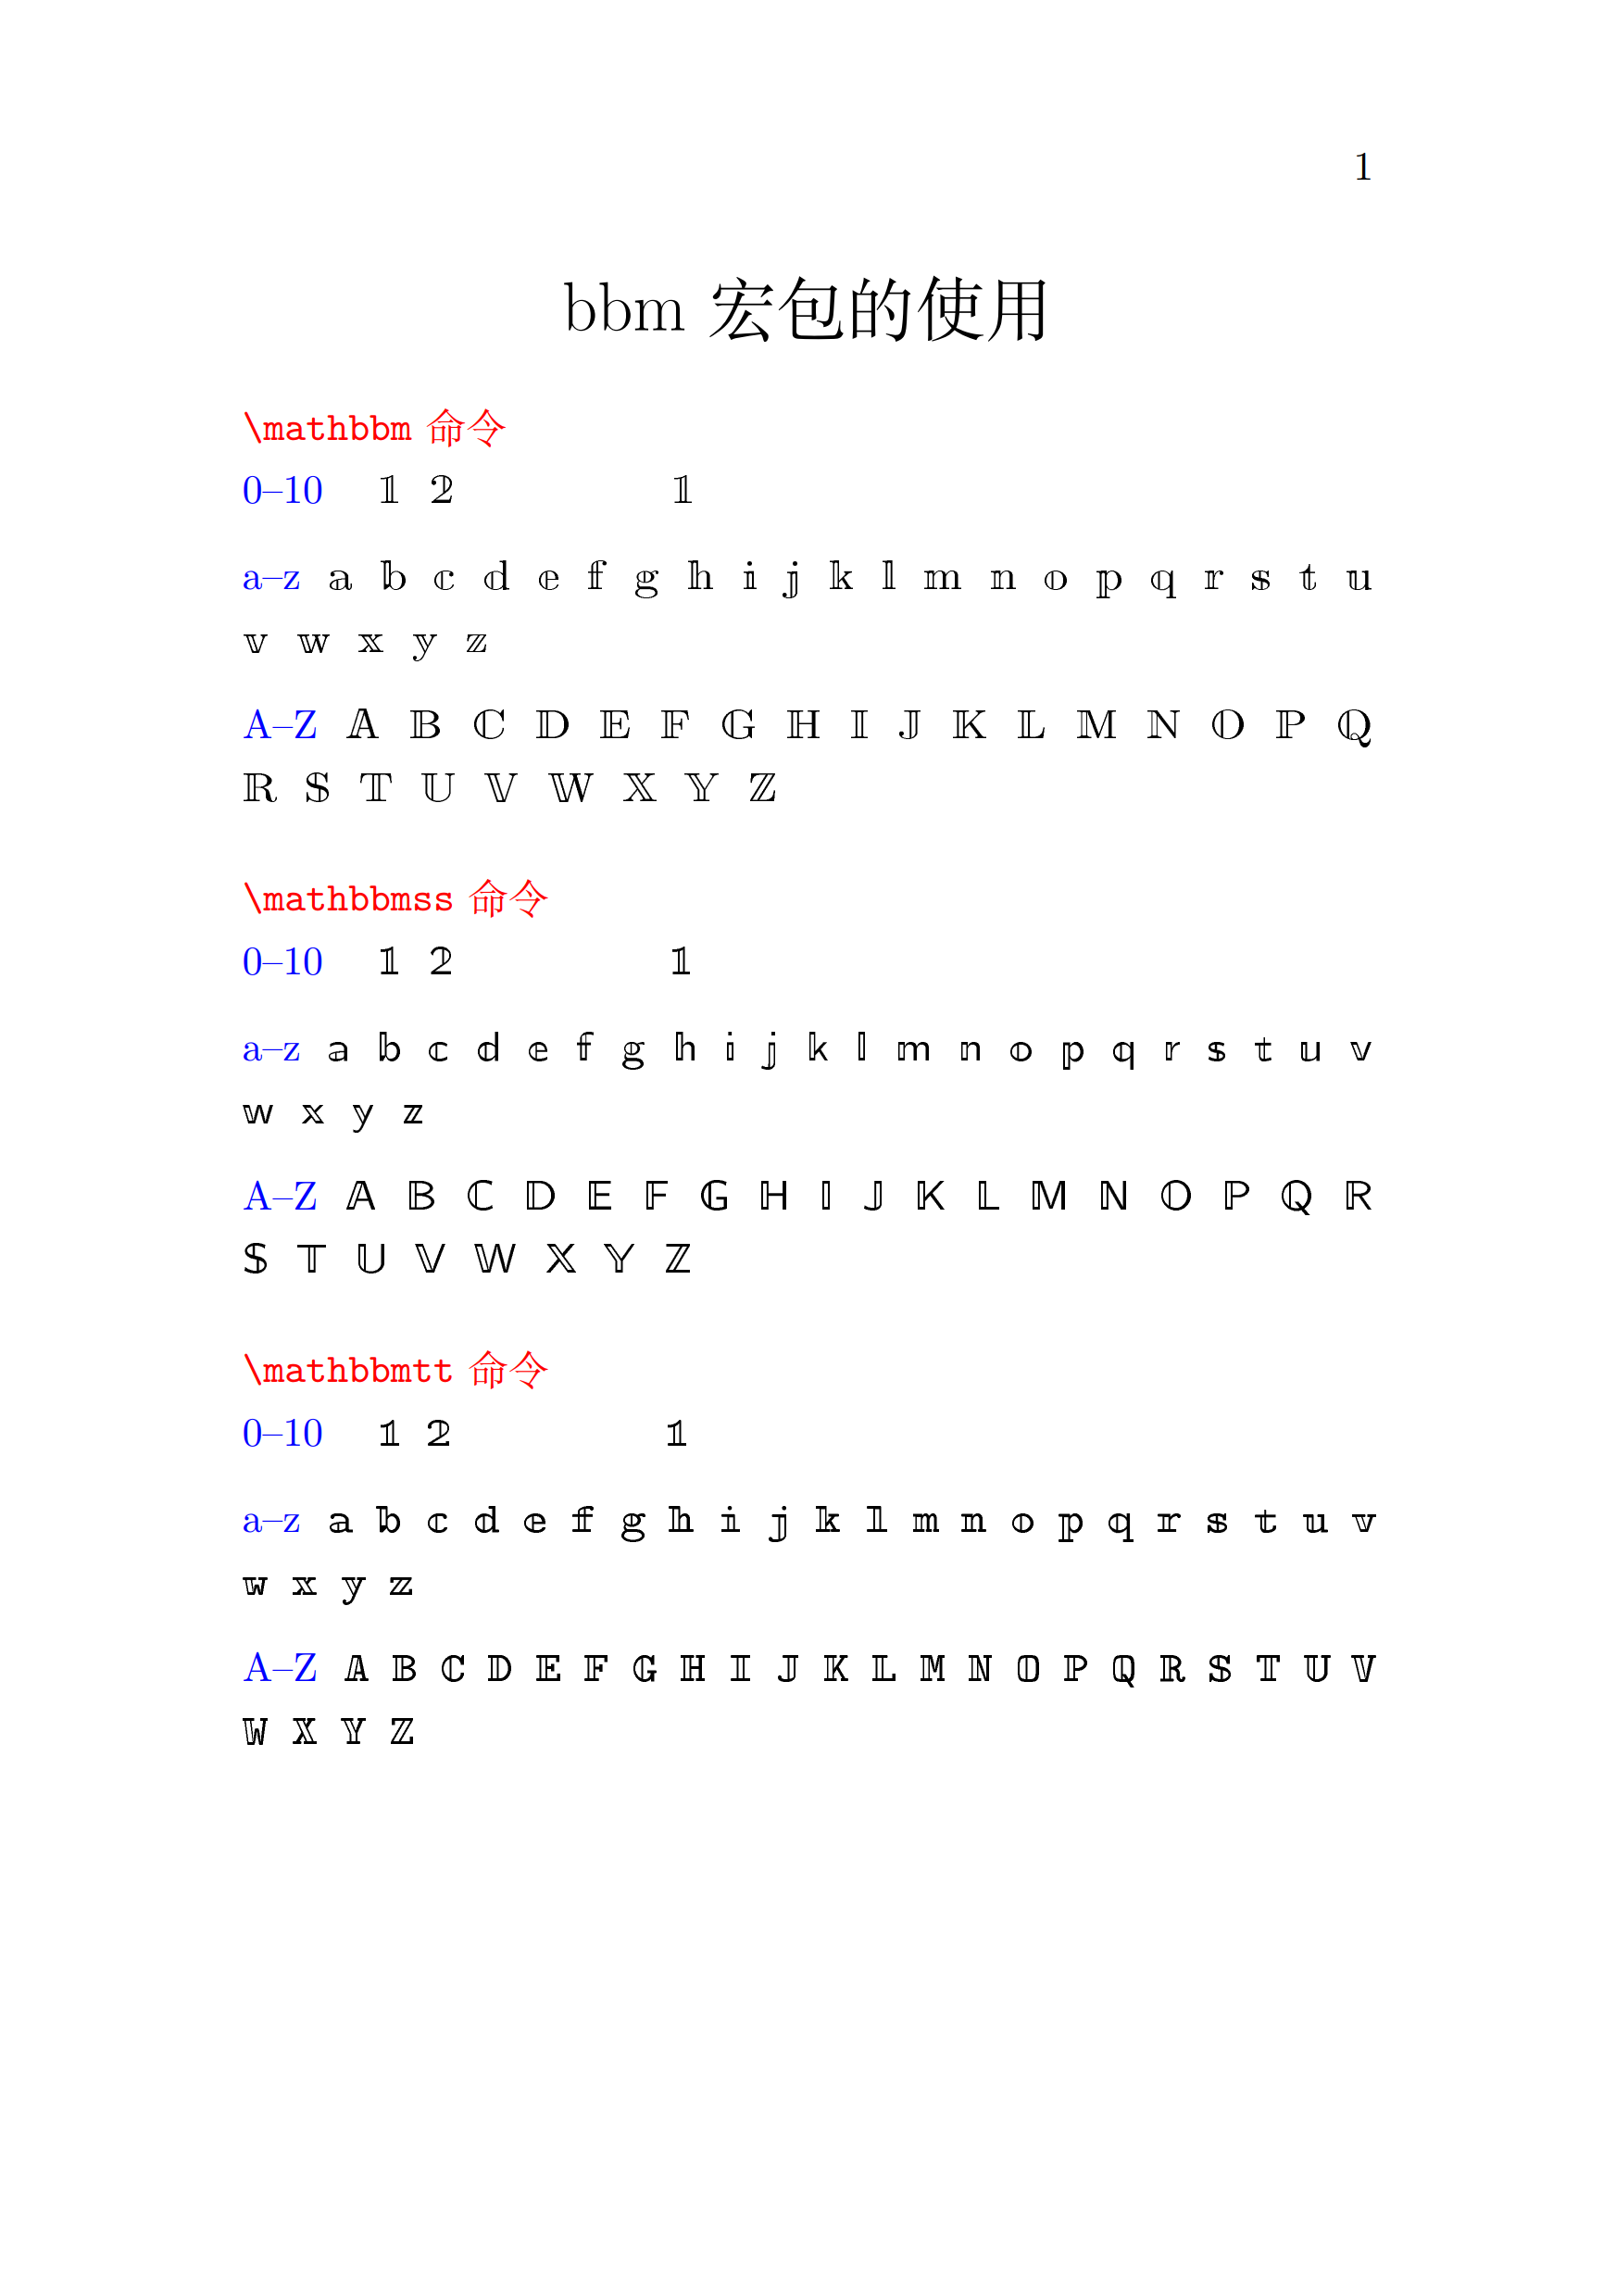 bbm宏包的使用 空心数字,空心字母